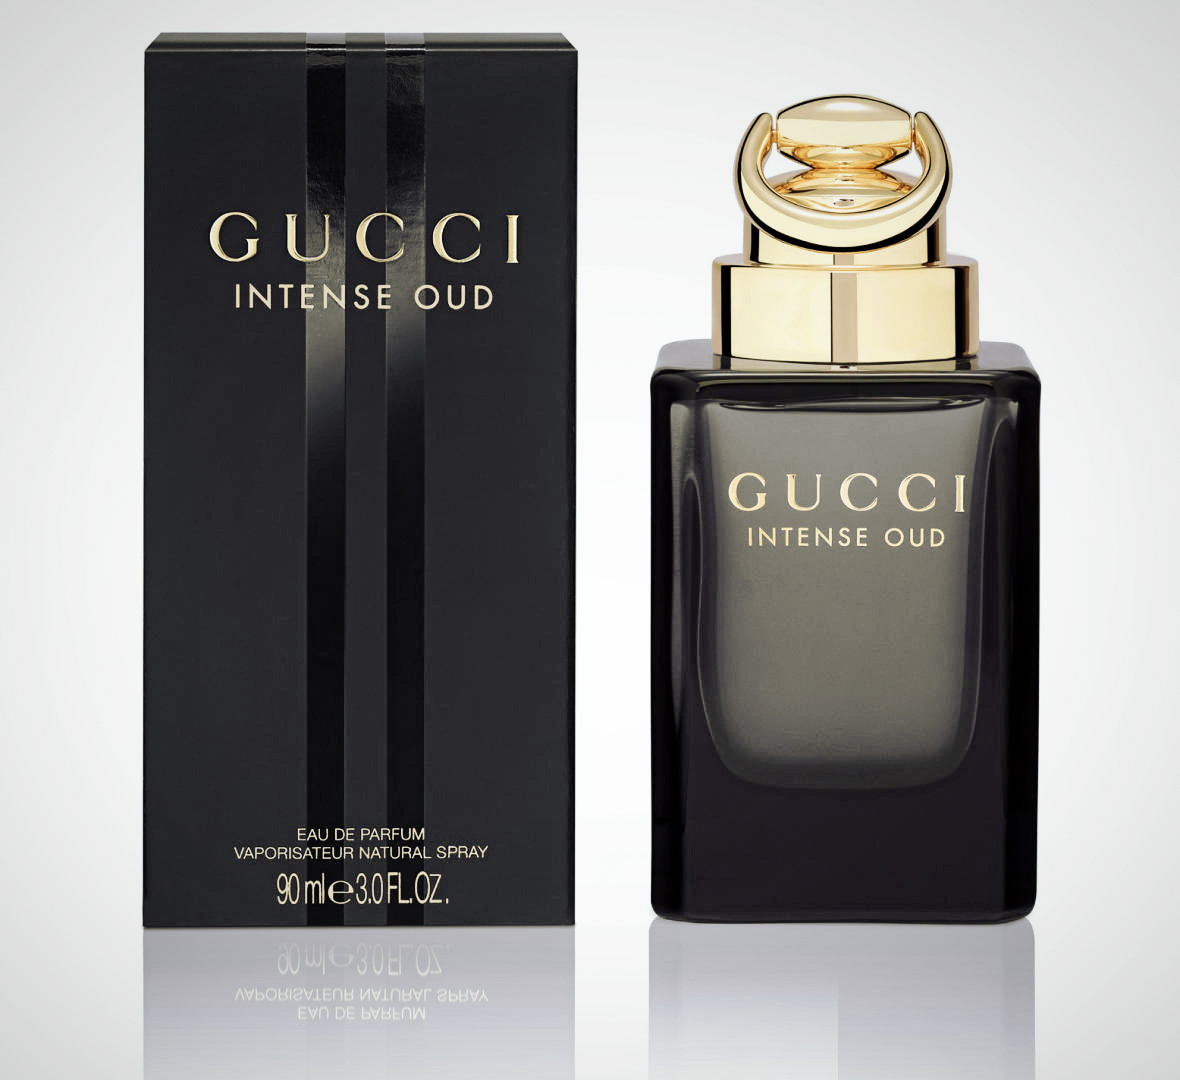 f6fdce2e21b43 عطر قوتشي عود إنتنس للرجال Gucci Intense Oud